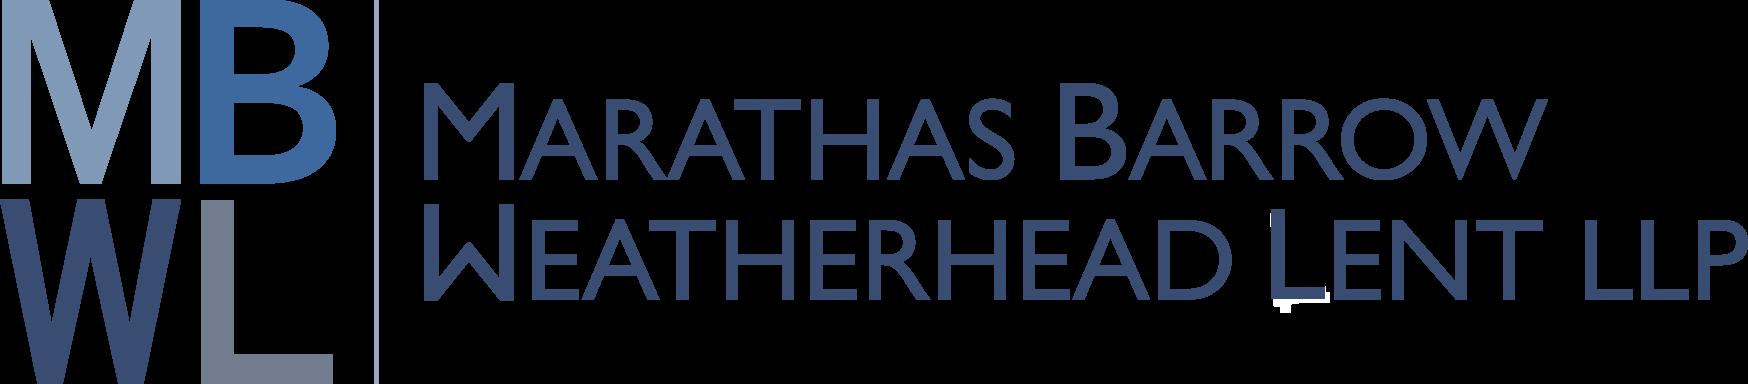 Marathas Barrow Weatherhead Lent